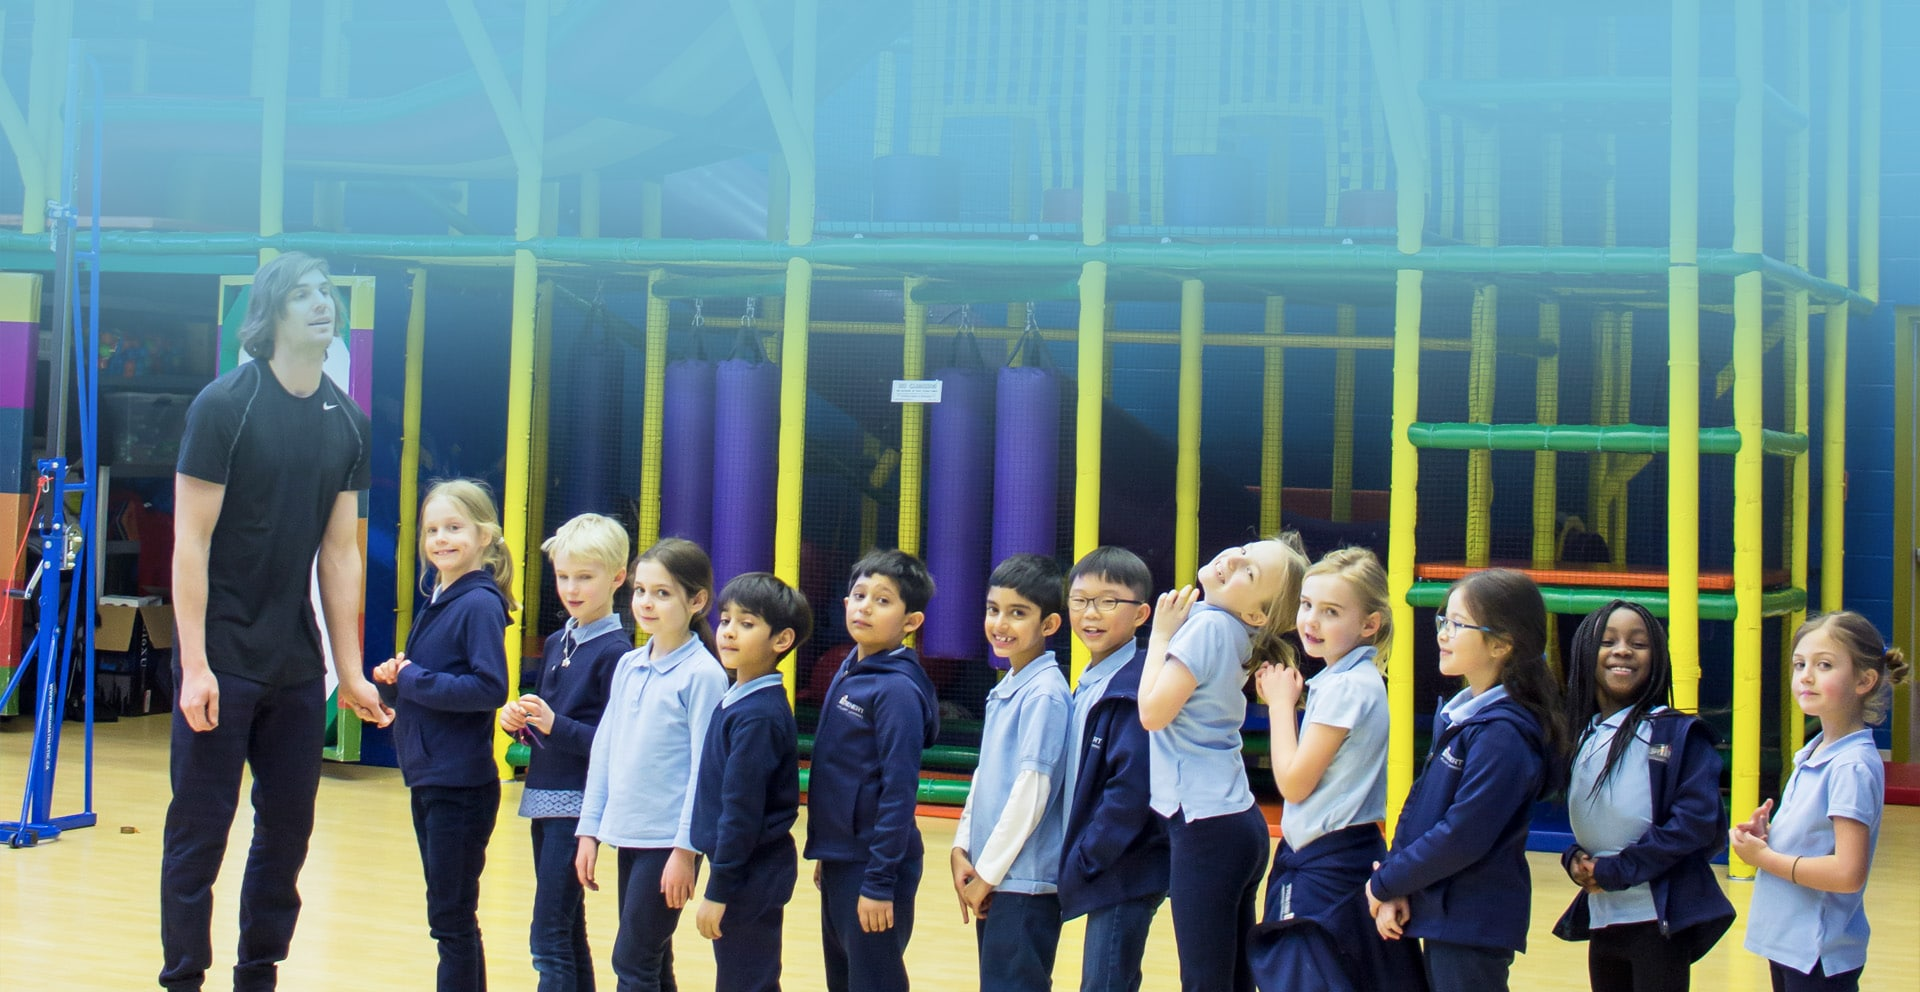 Renert school private calgary royal oak higher education renertschool